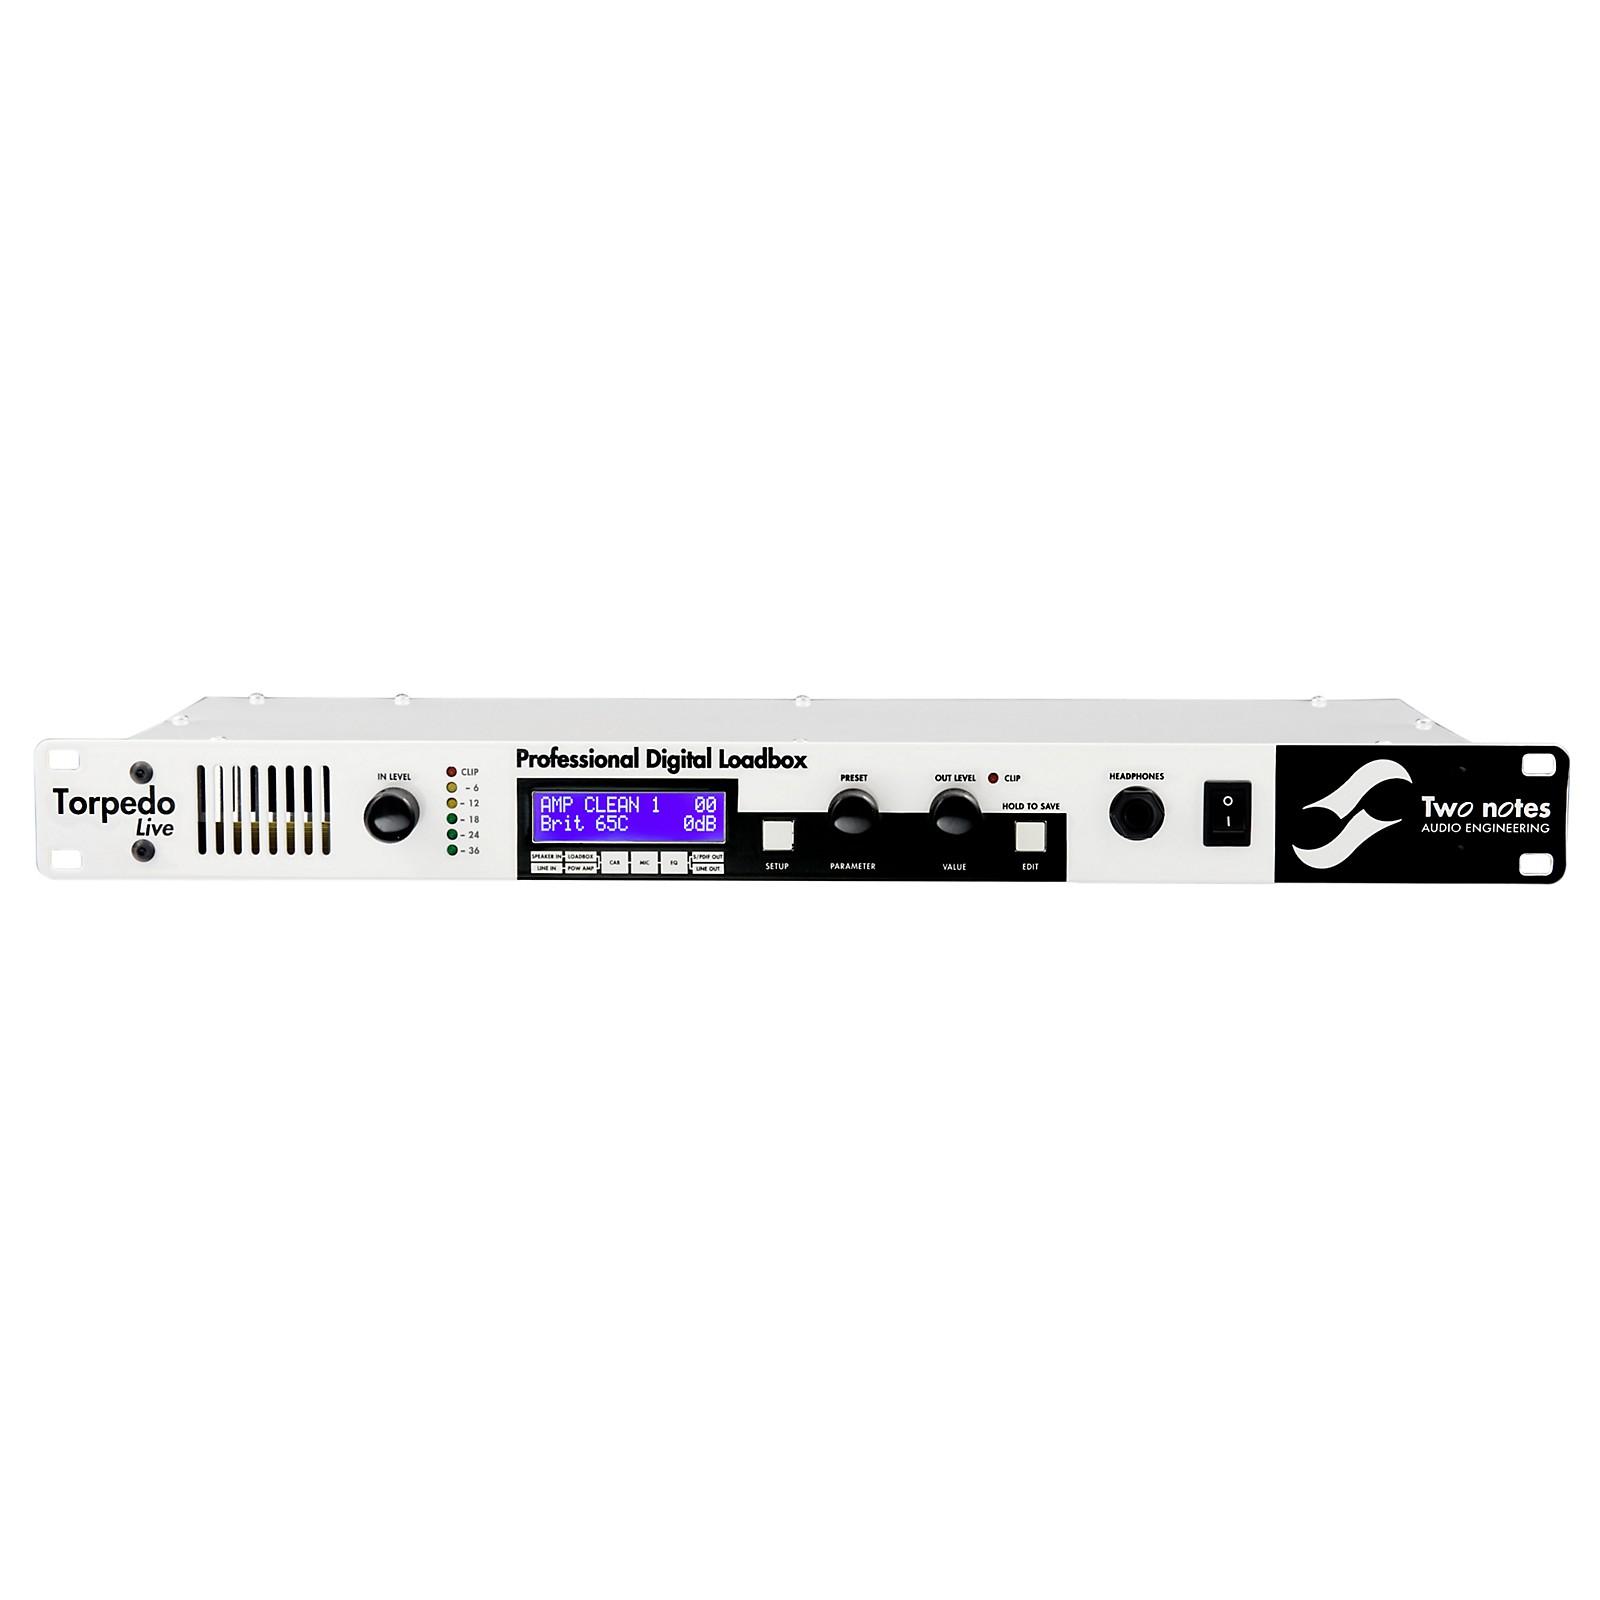 Two Notes Audio Engineering Torpedo Live Digital Loadbox/ Speaker Simulator